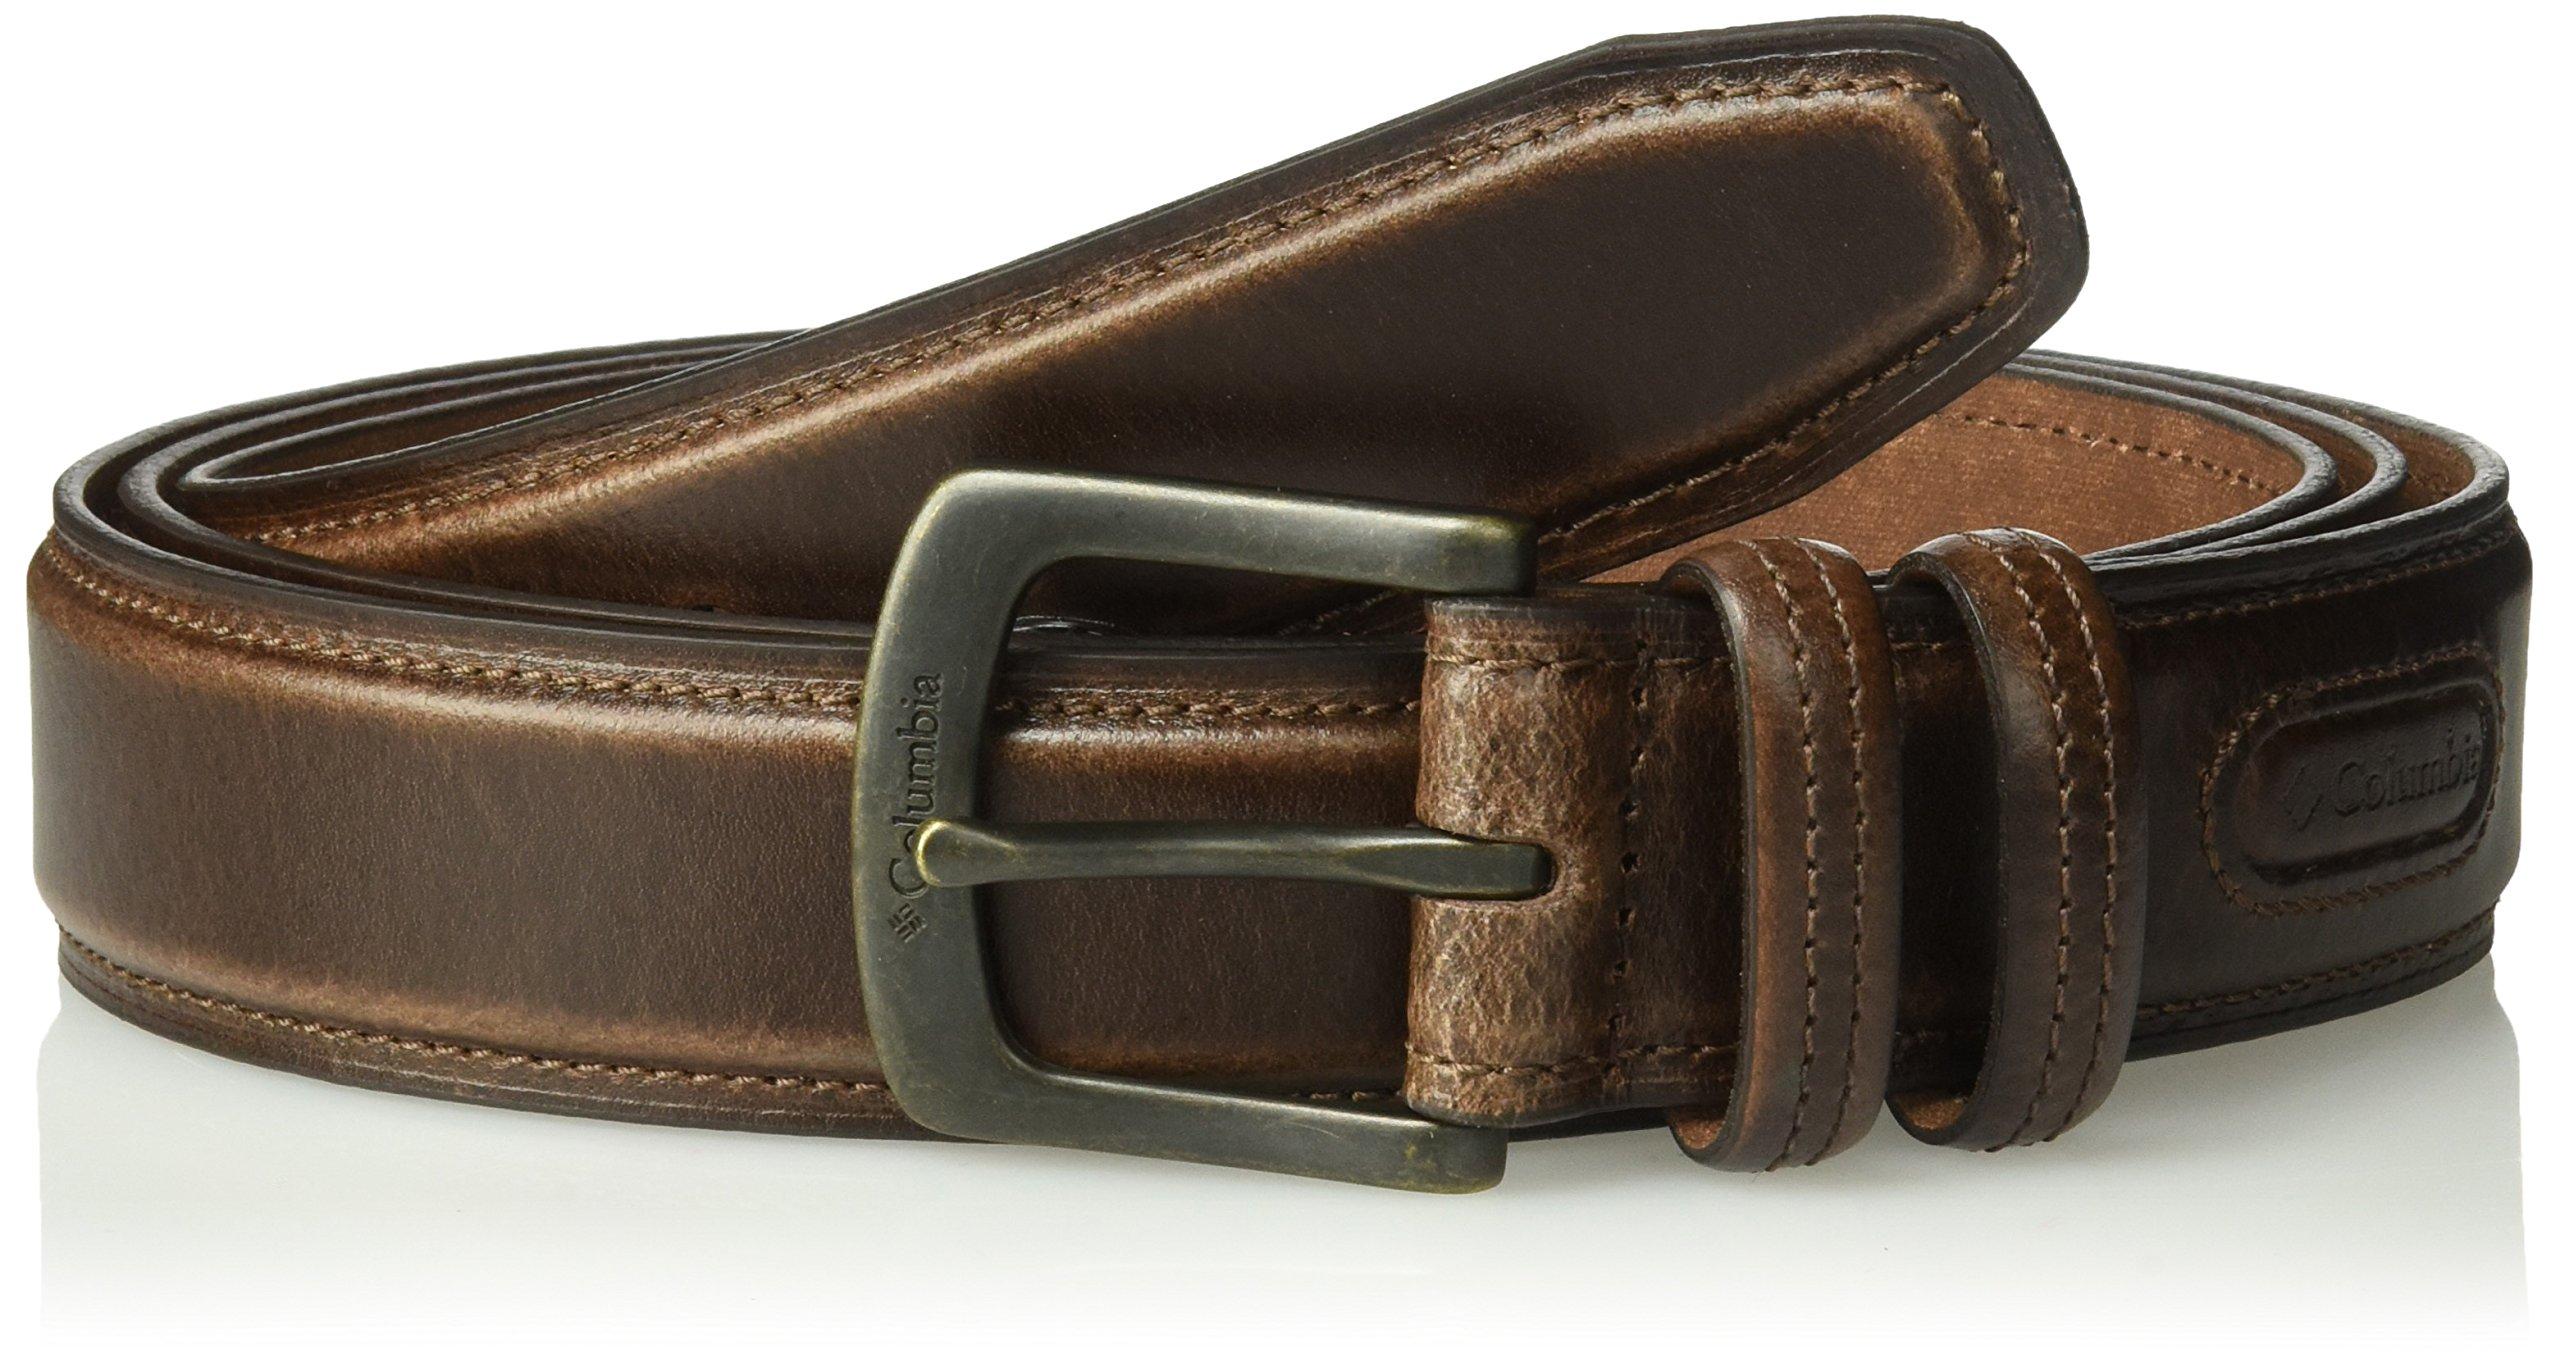 Columbia Men's 1 9/16 in. Oil Tan Leather Belt,Brown,36